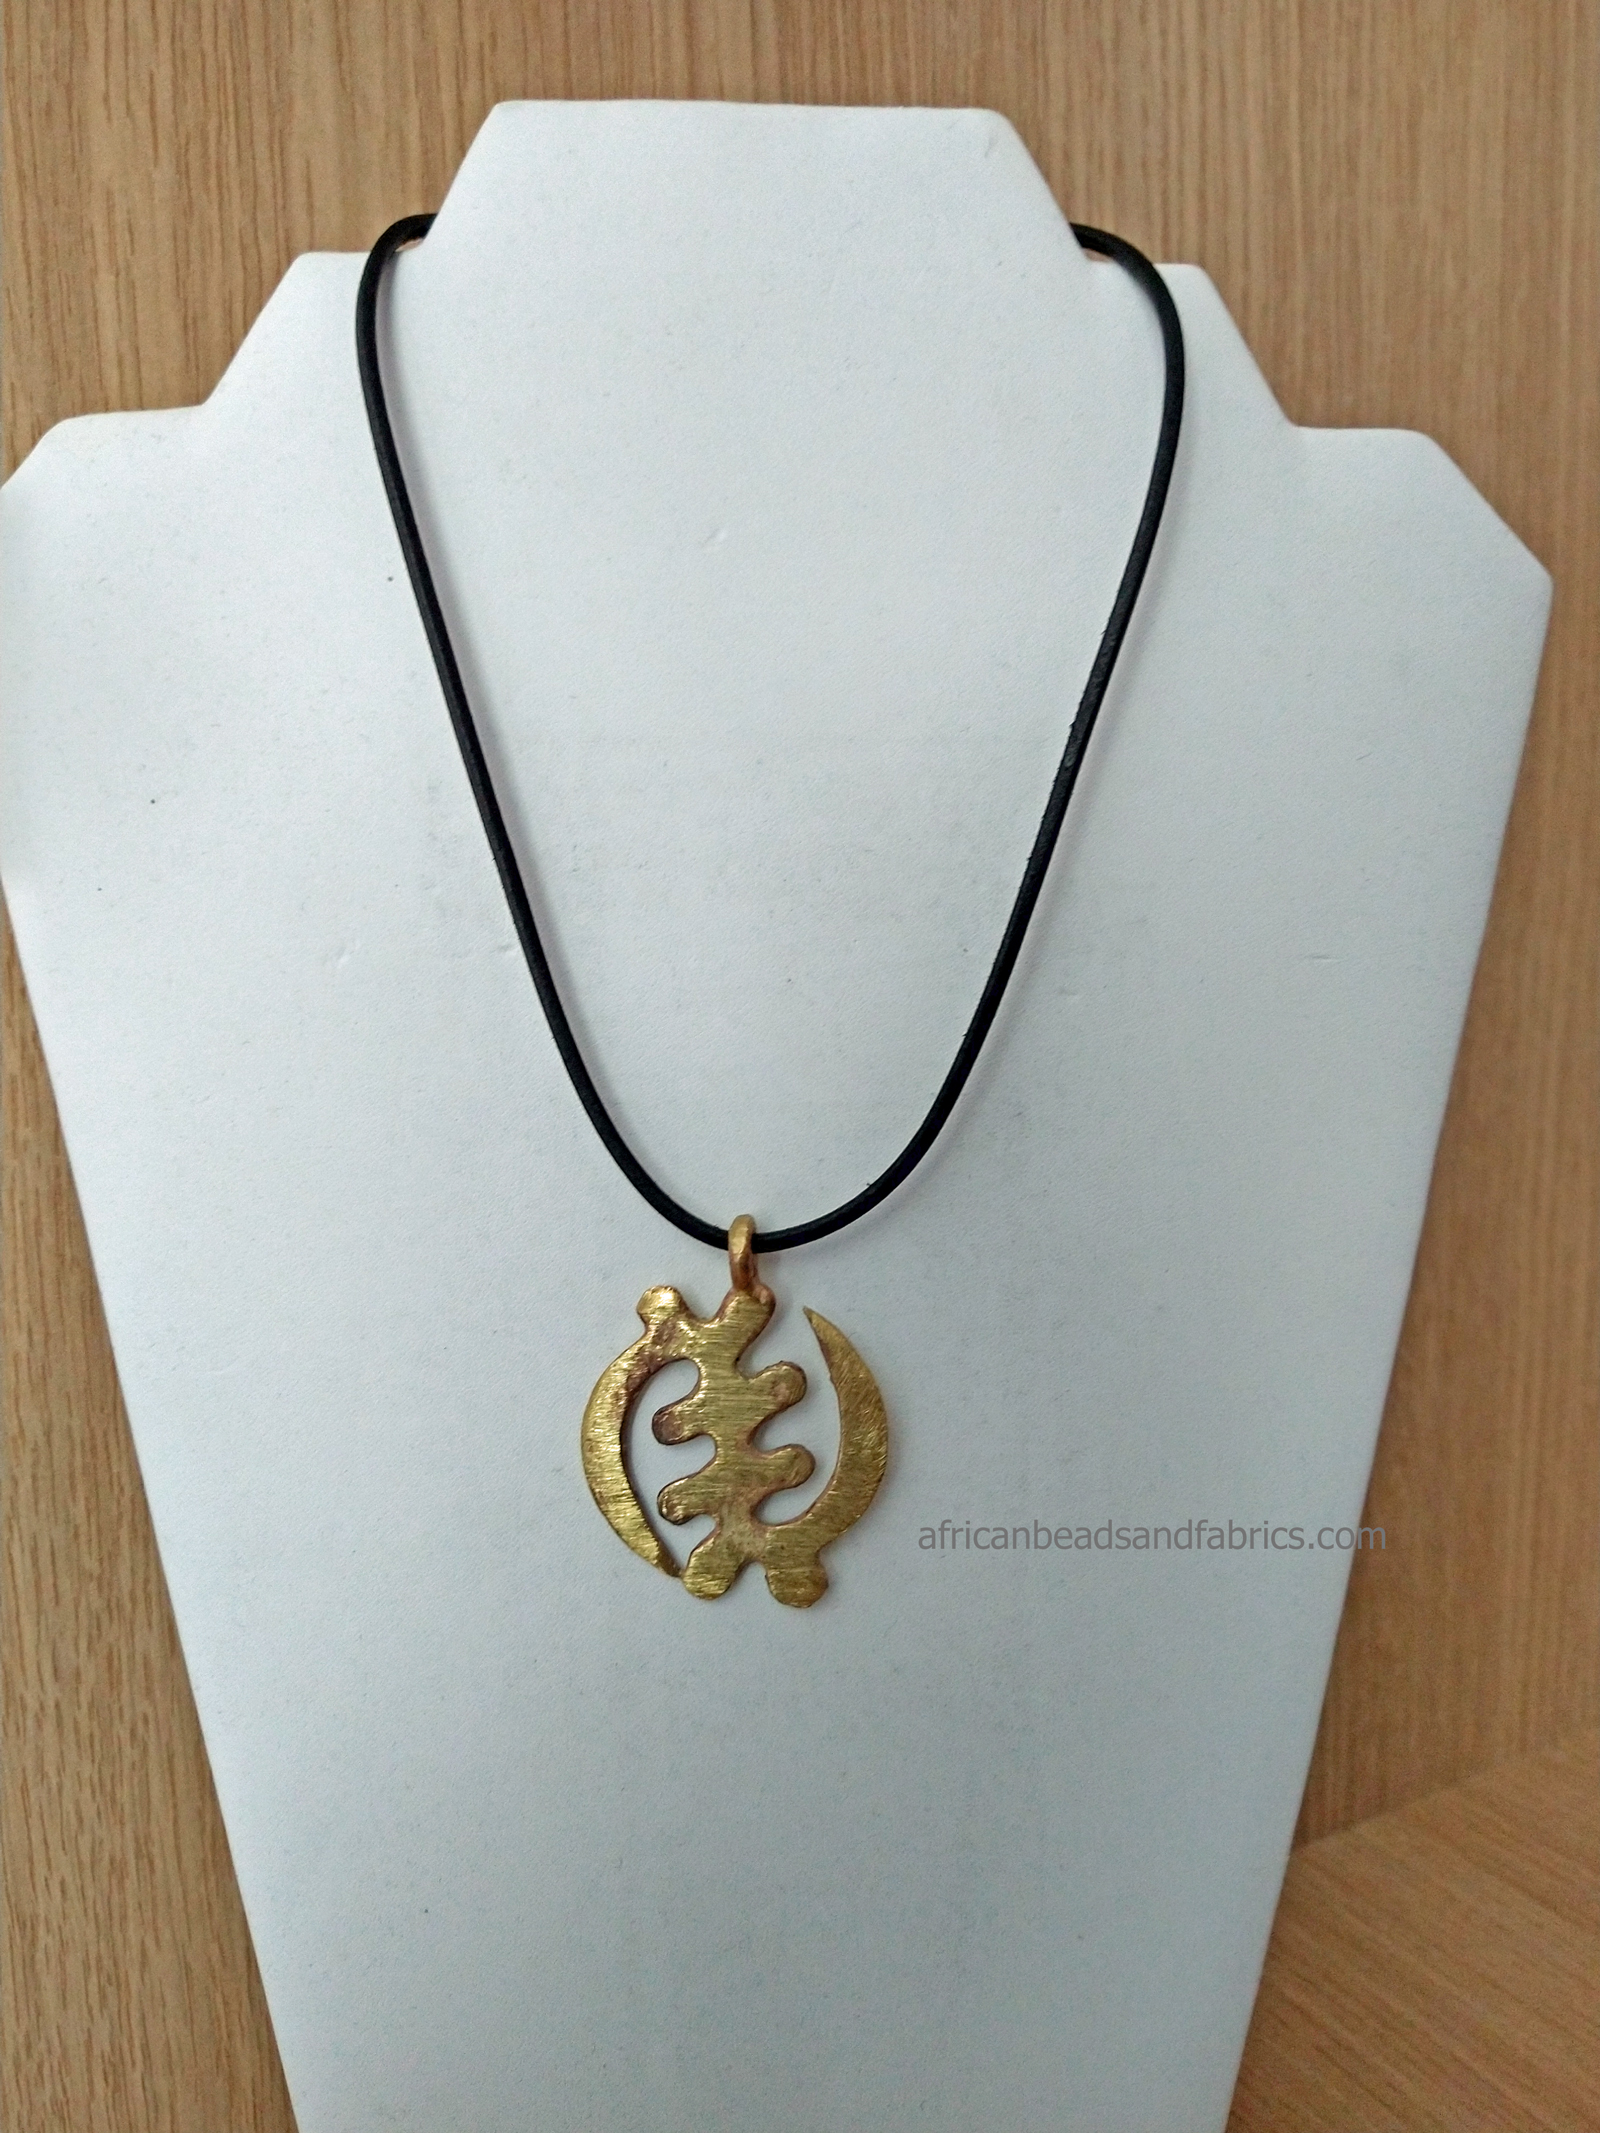 African-Jewellery-Adinkra-Gye-Nyame-Pendant-on-buffalo-leather-cord-watermarked